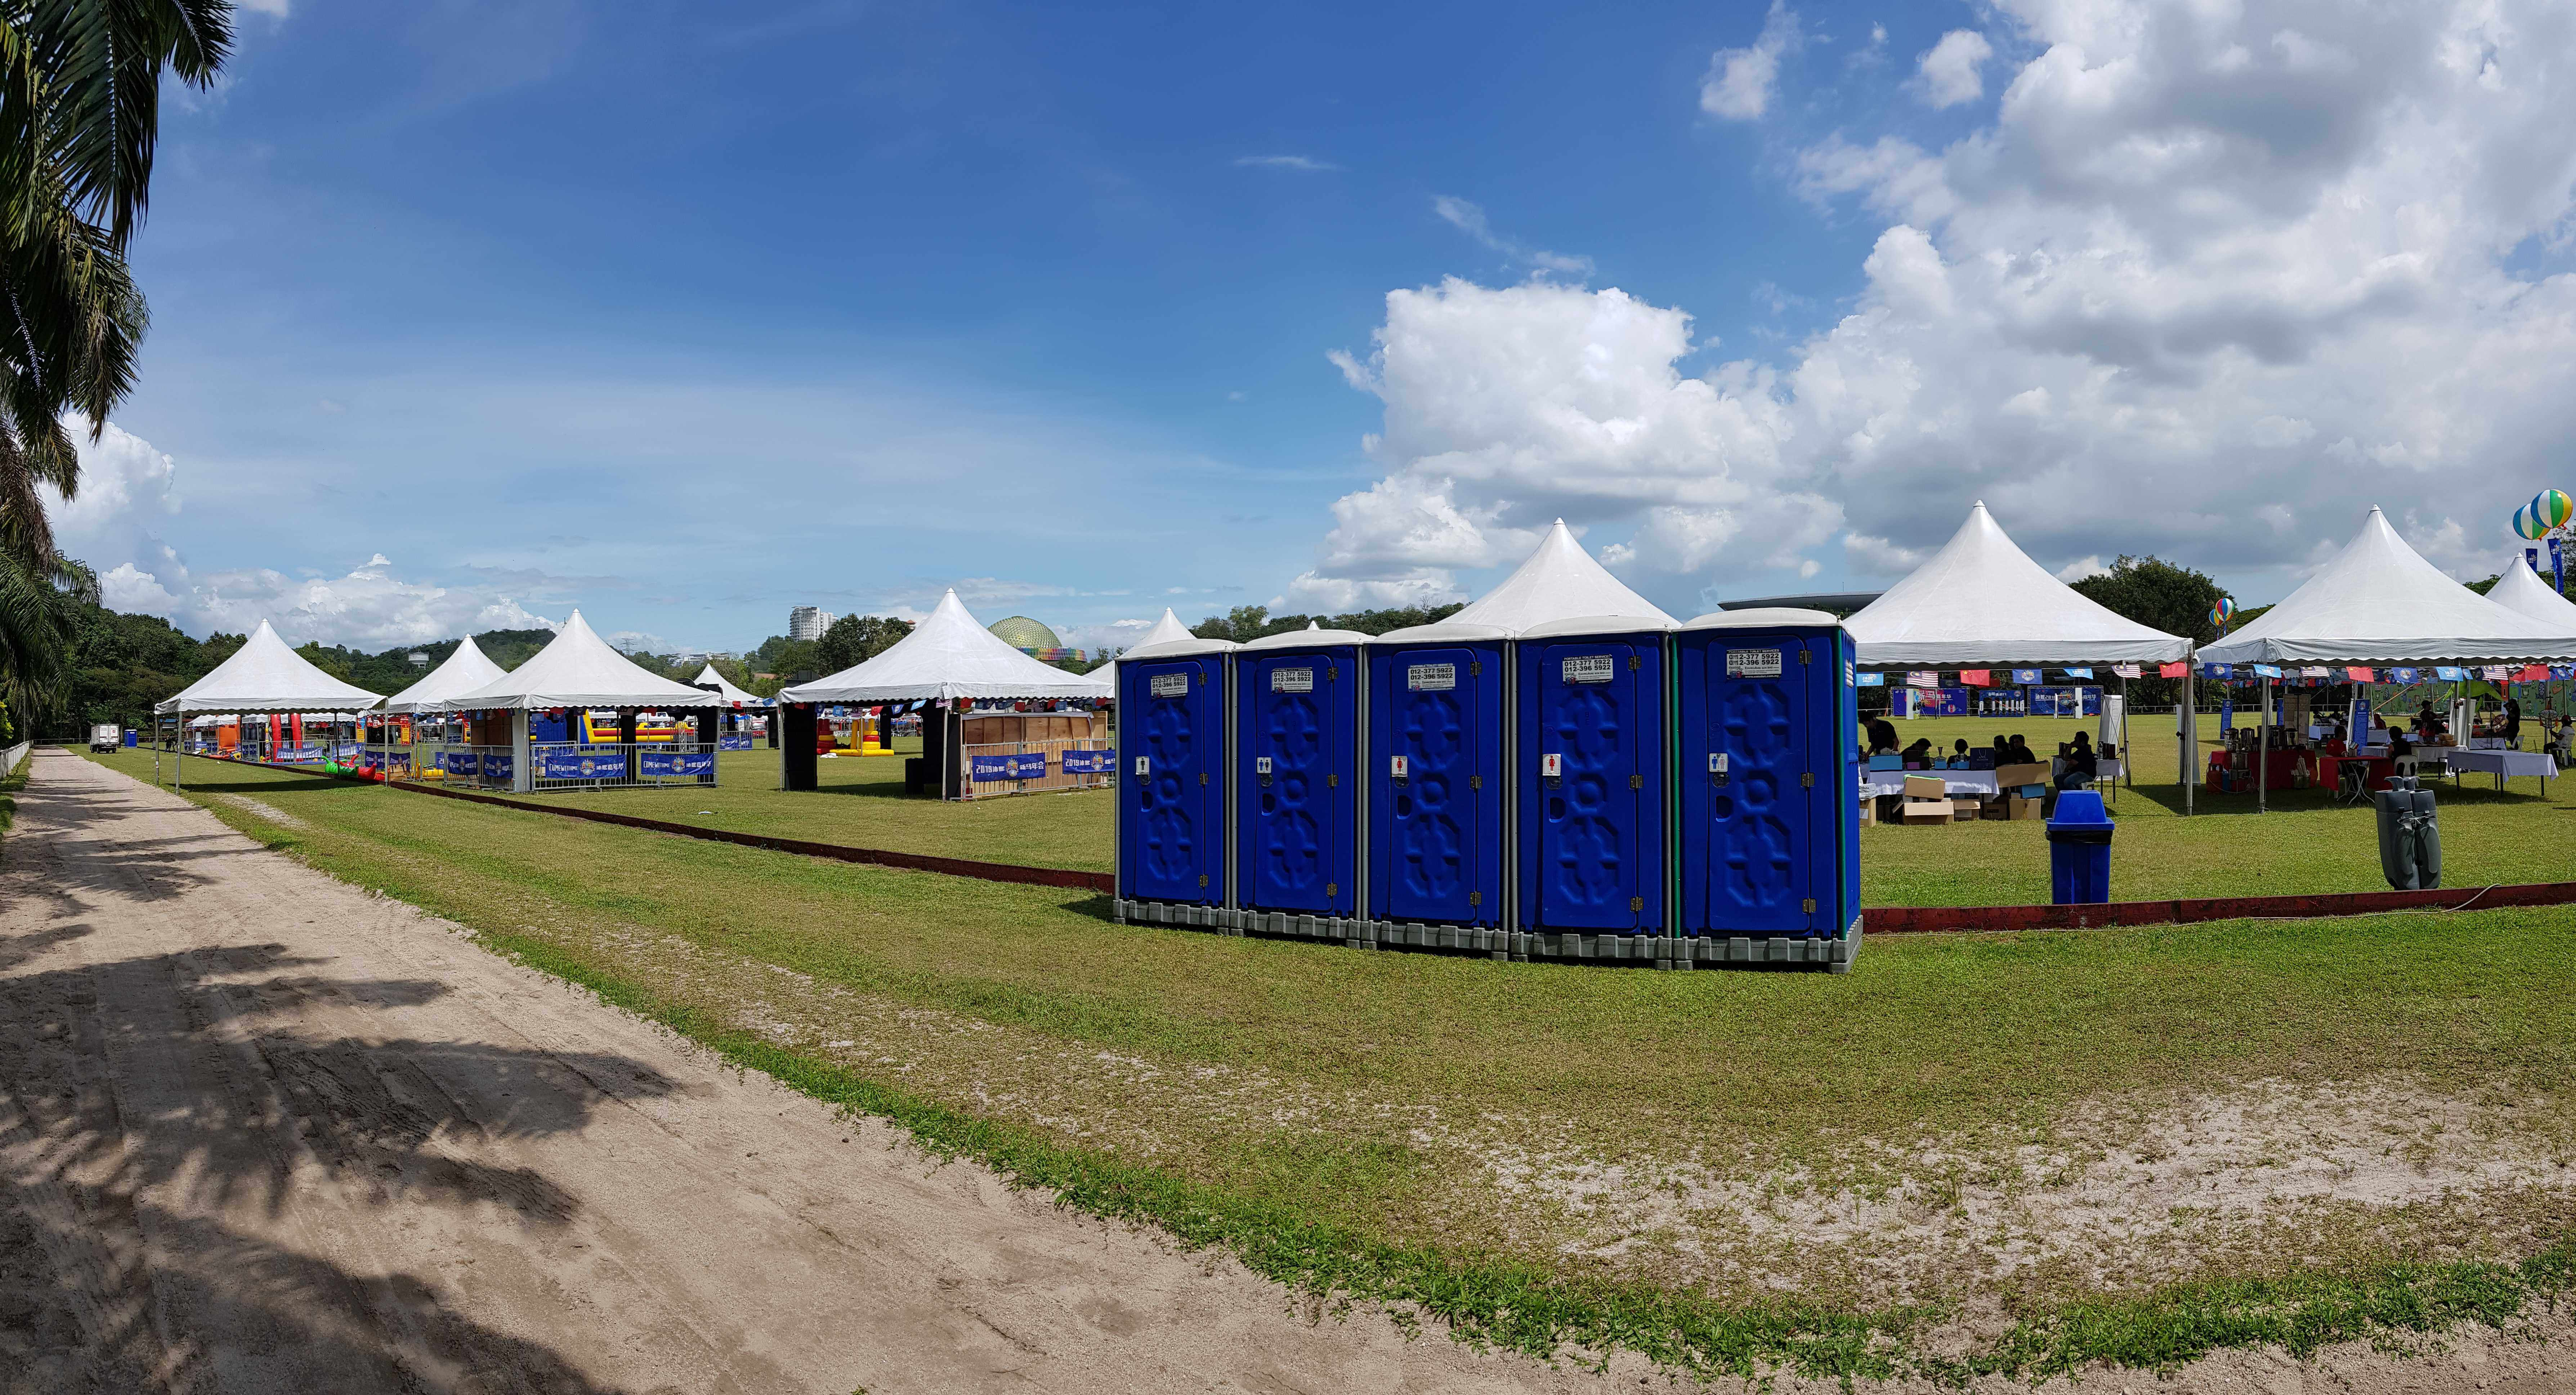 portable-toilet-rental-moses-malaysia-carnival-bukit-kiara